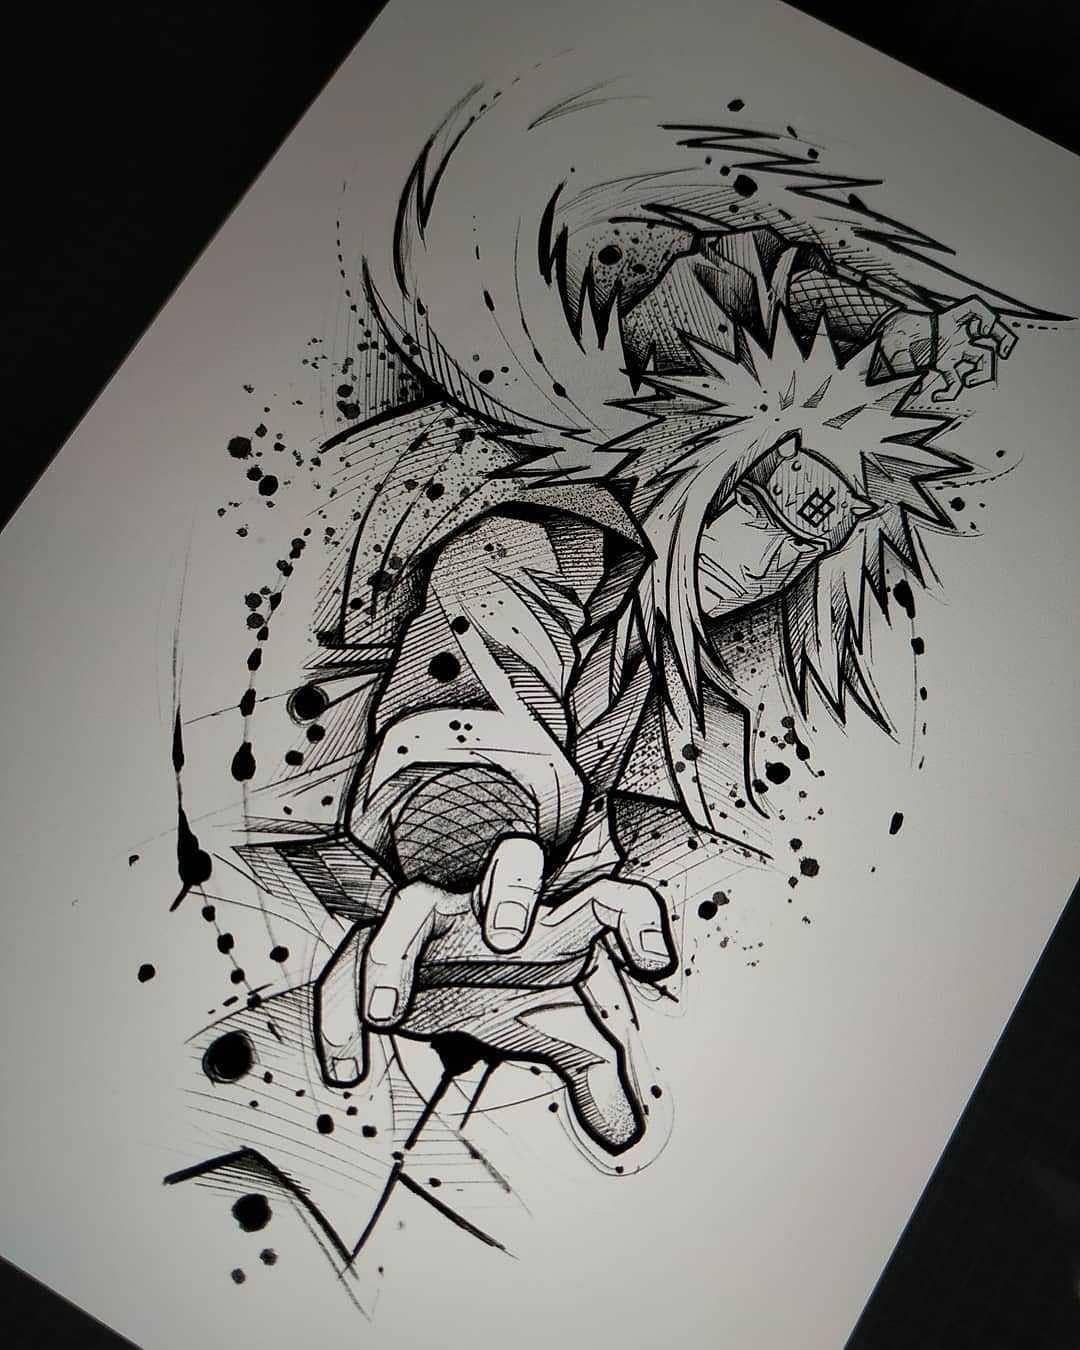 Pin By Mmgg13 On Anime Naruto Sketch Naruto Drawings Naruto Tattoo